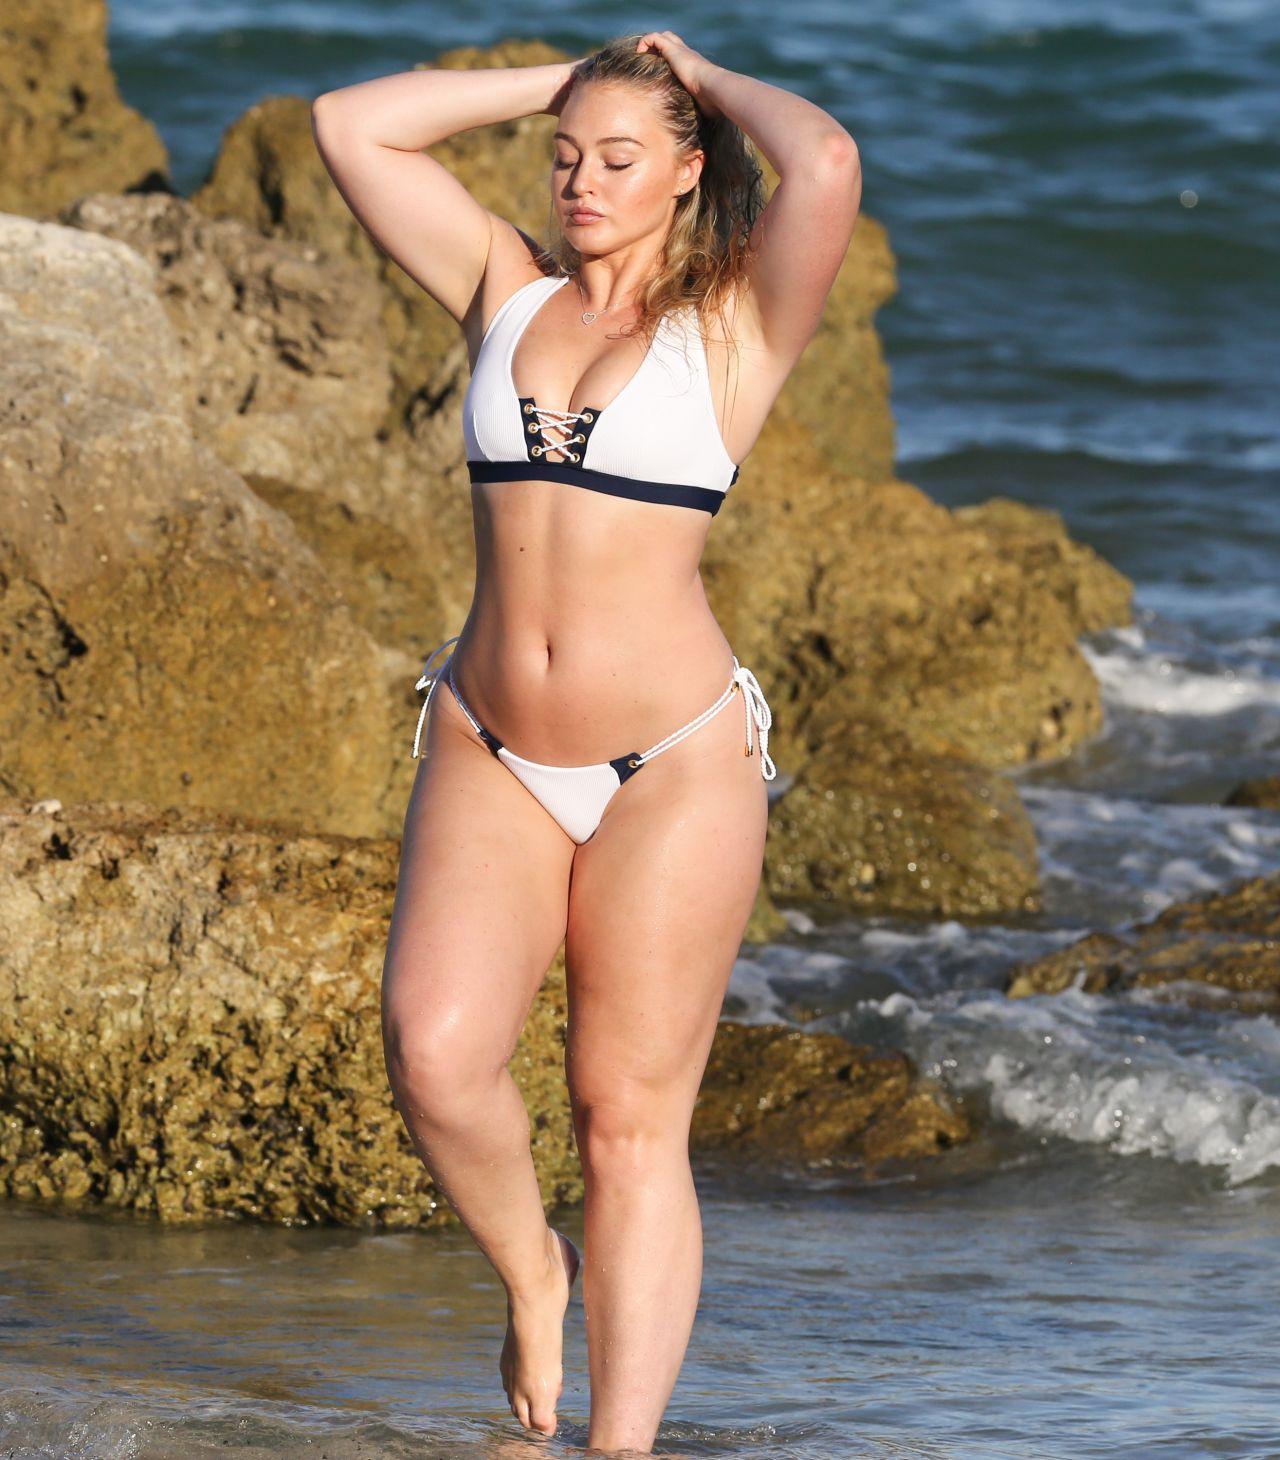 Iskra Lawrence Bikini Photoshoot Beach In Miami Fl July